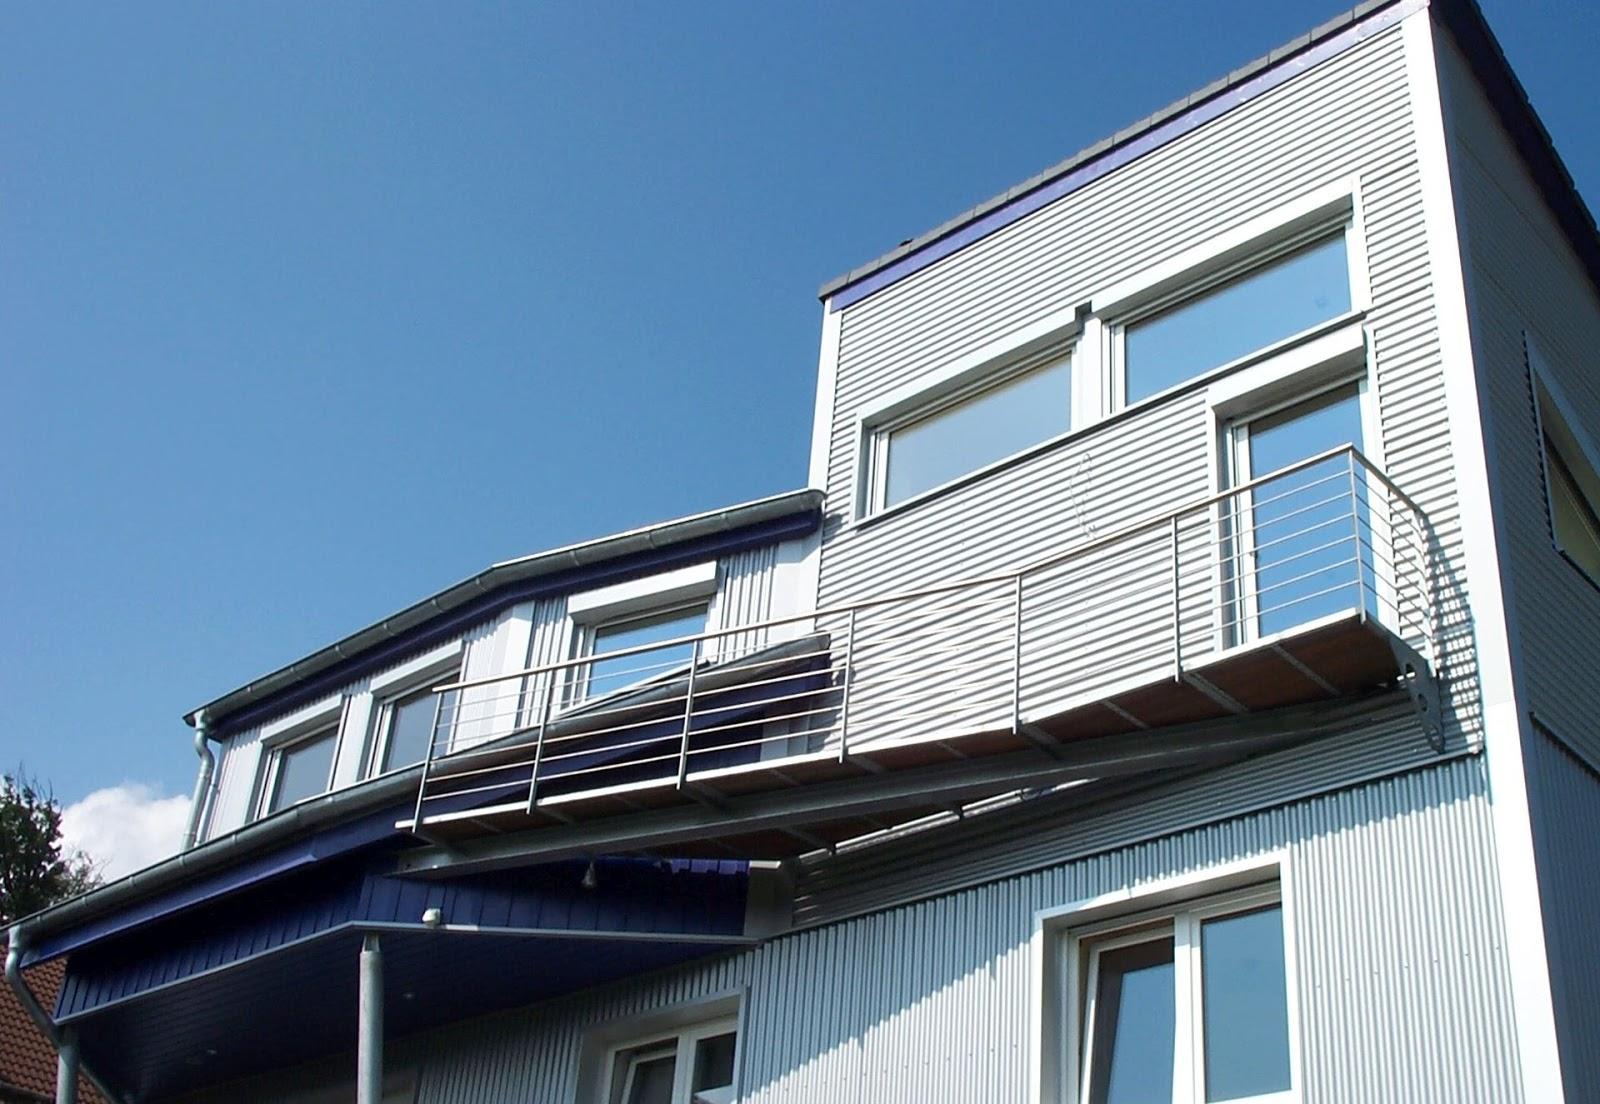 balkongel nder verzinkt pulverbeschichtet wohn design. Black Bedroom Furniture Sets. Home Design Ideas